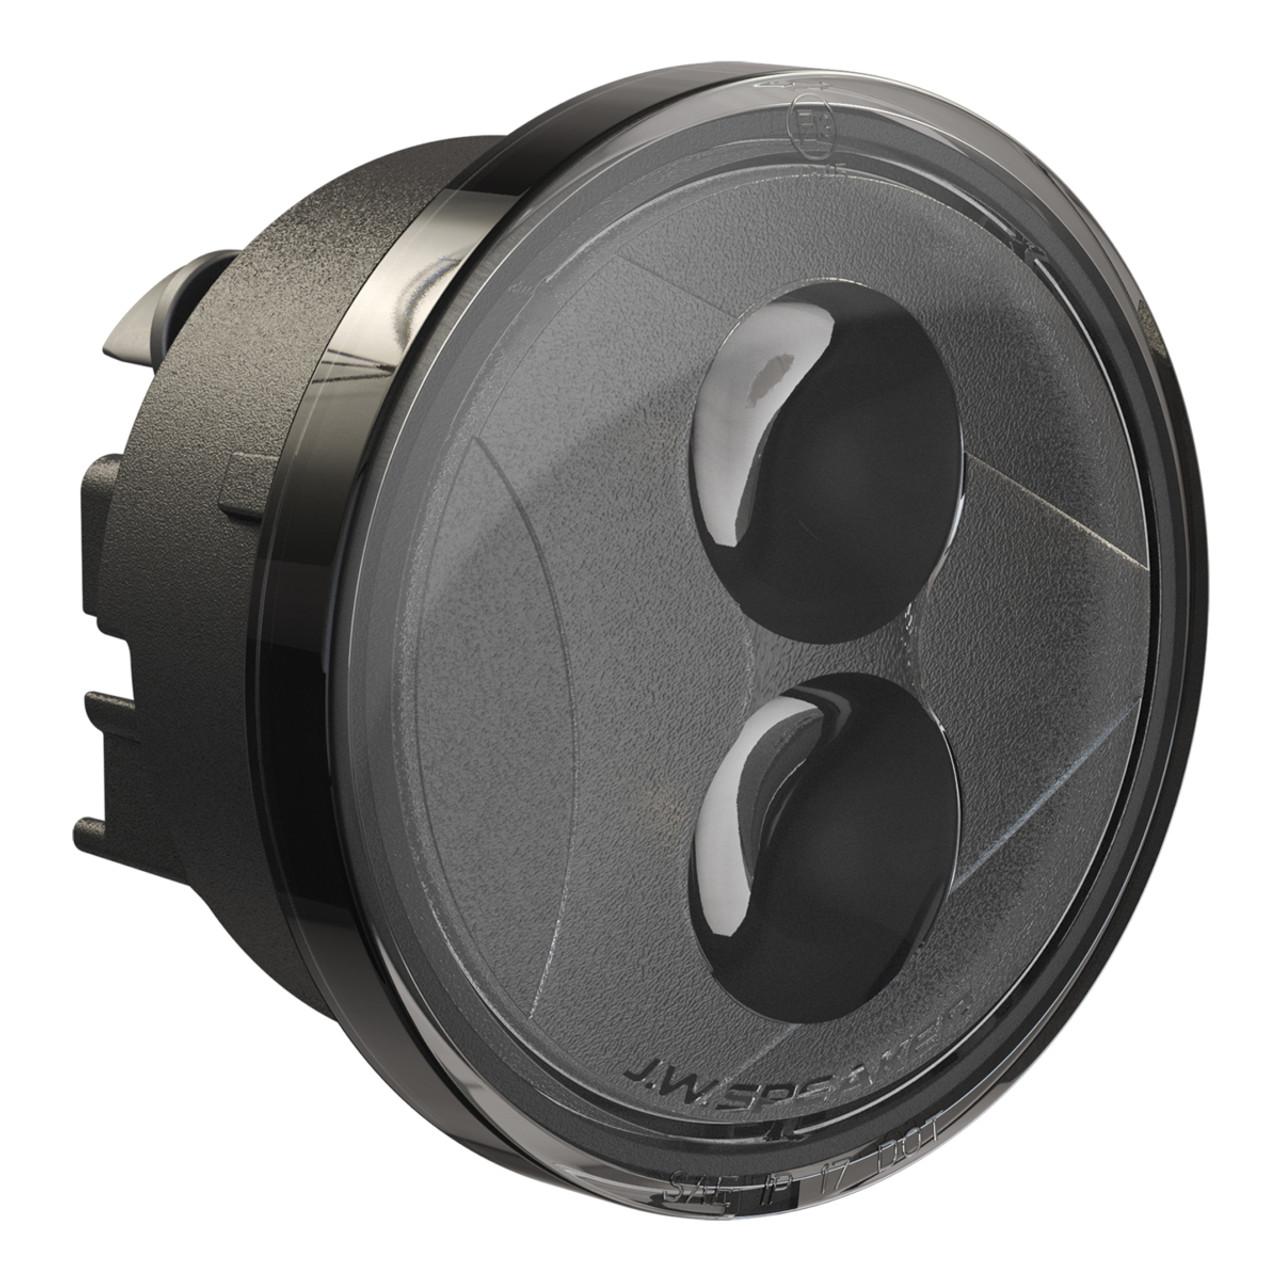 JW Speaker J2 Series Front Turn Signals (Wrangler JK 2007-2018)